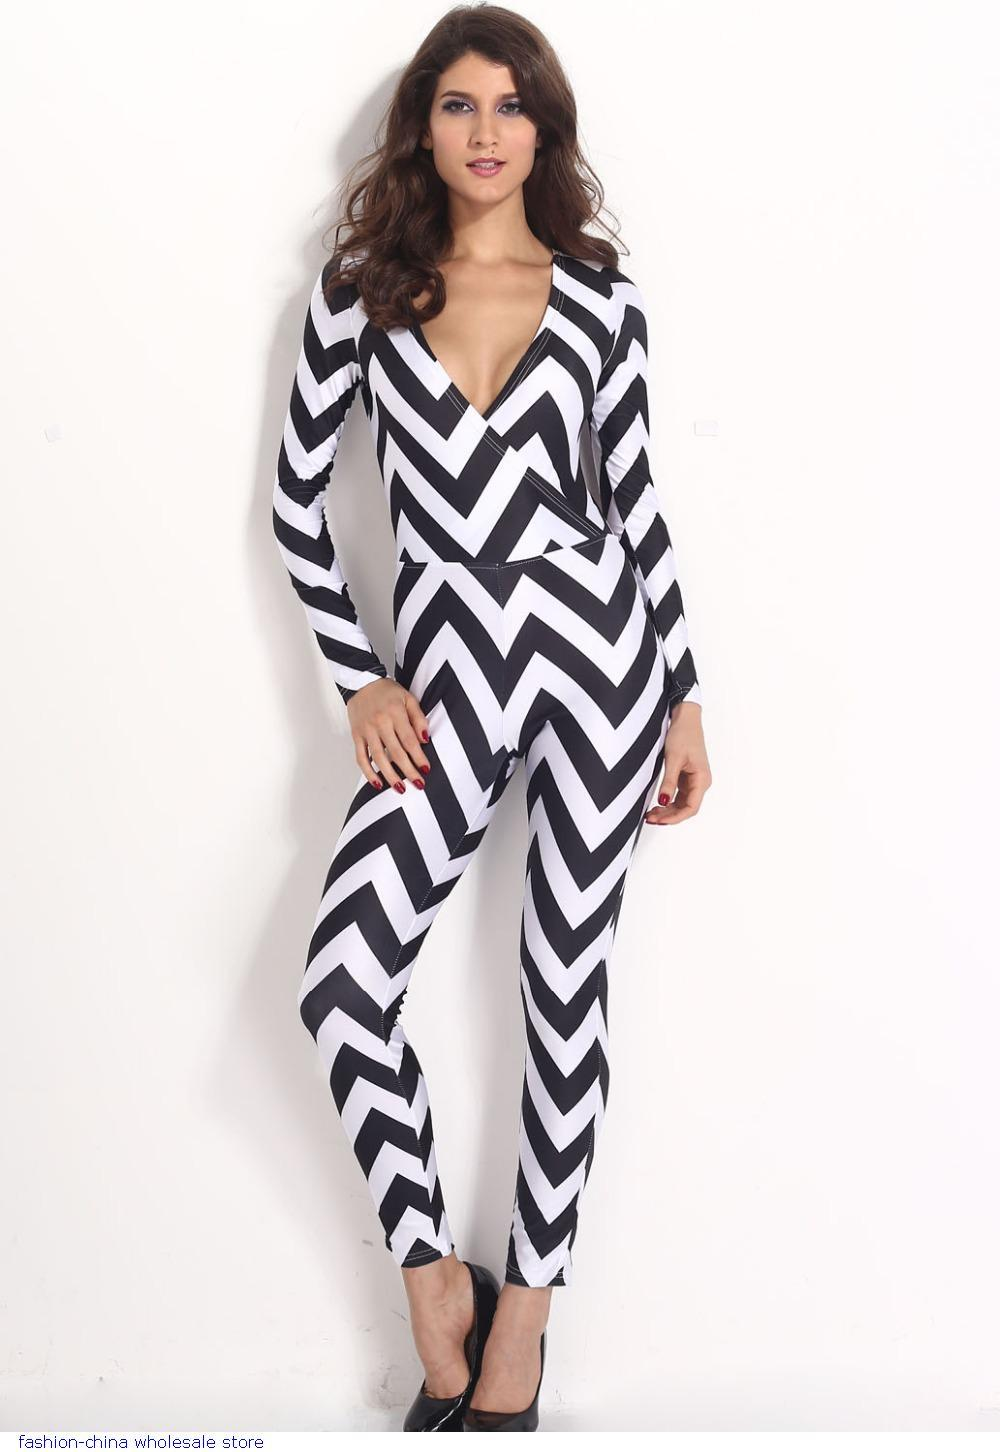 classic Retro fashion | Pretty woman in black and white dress | Capture that smile beauty